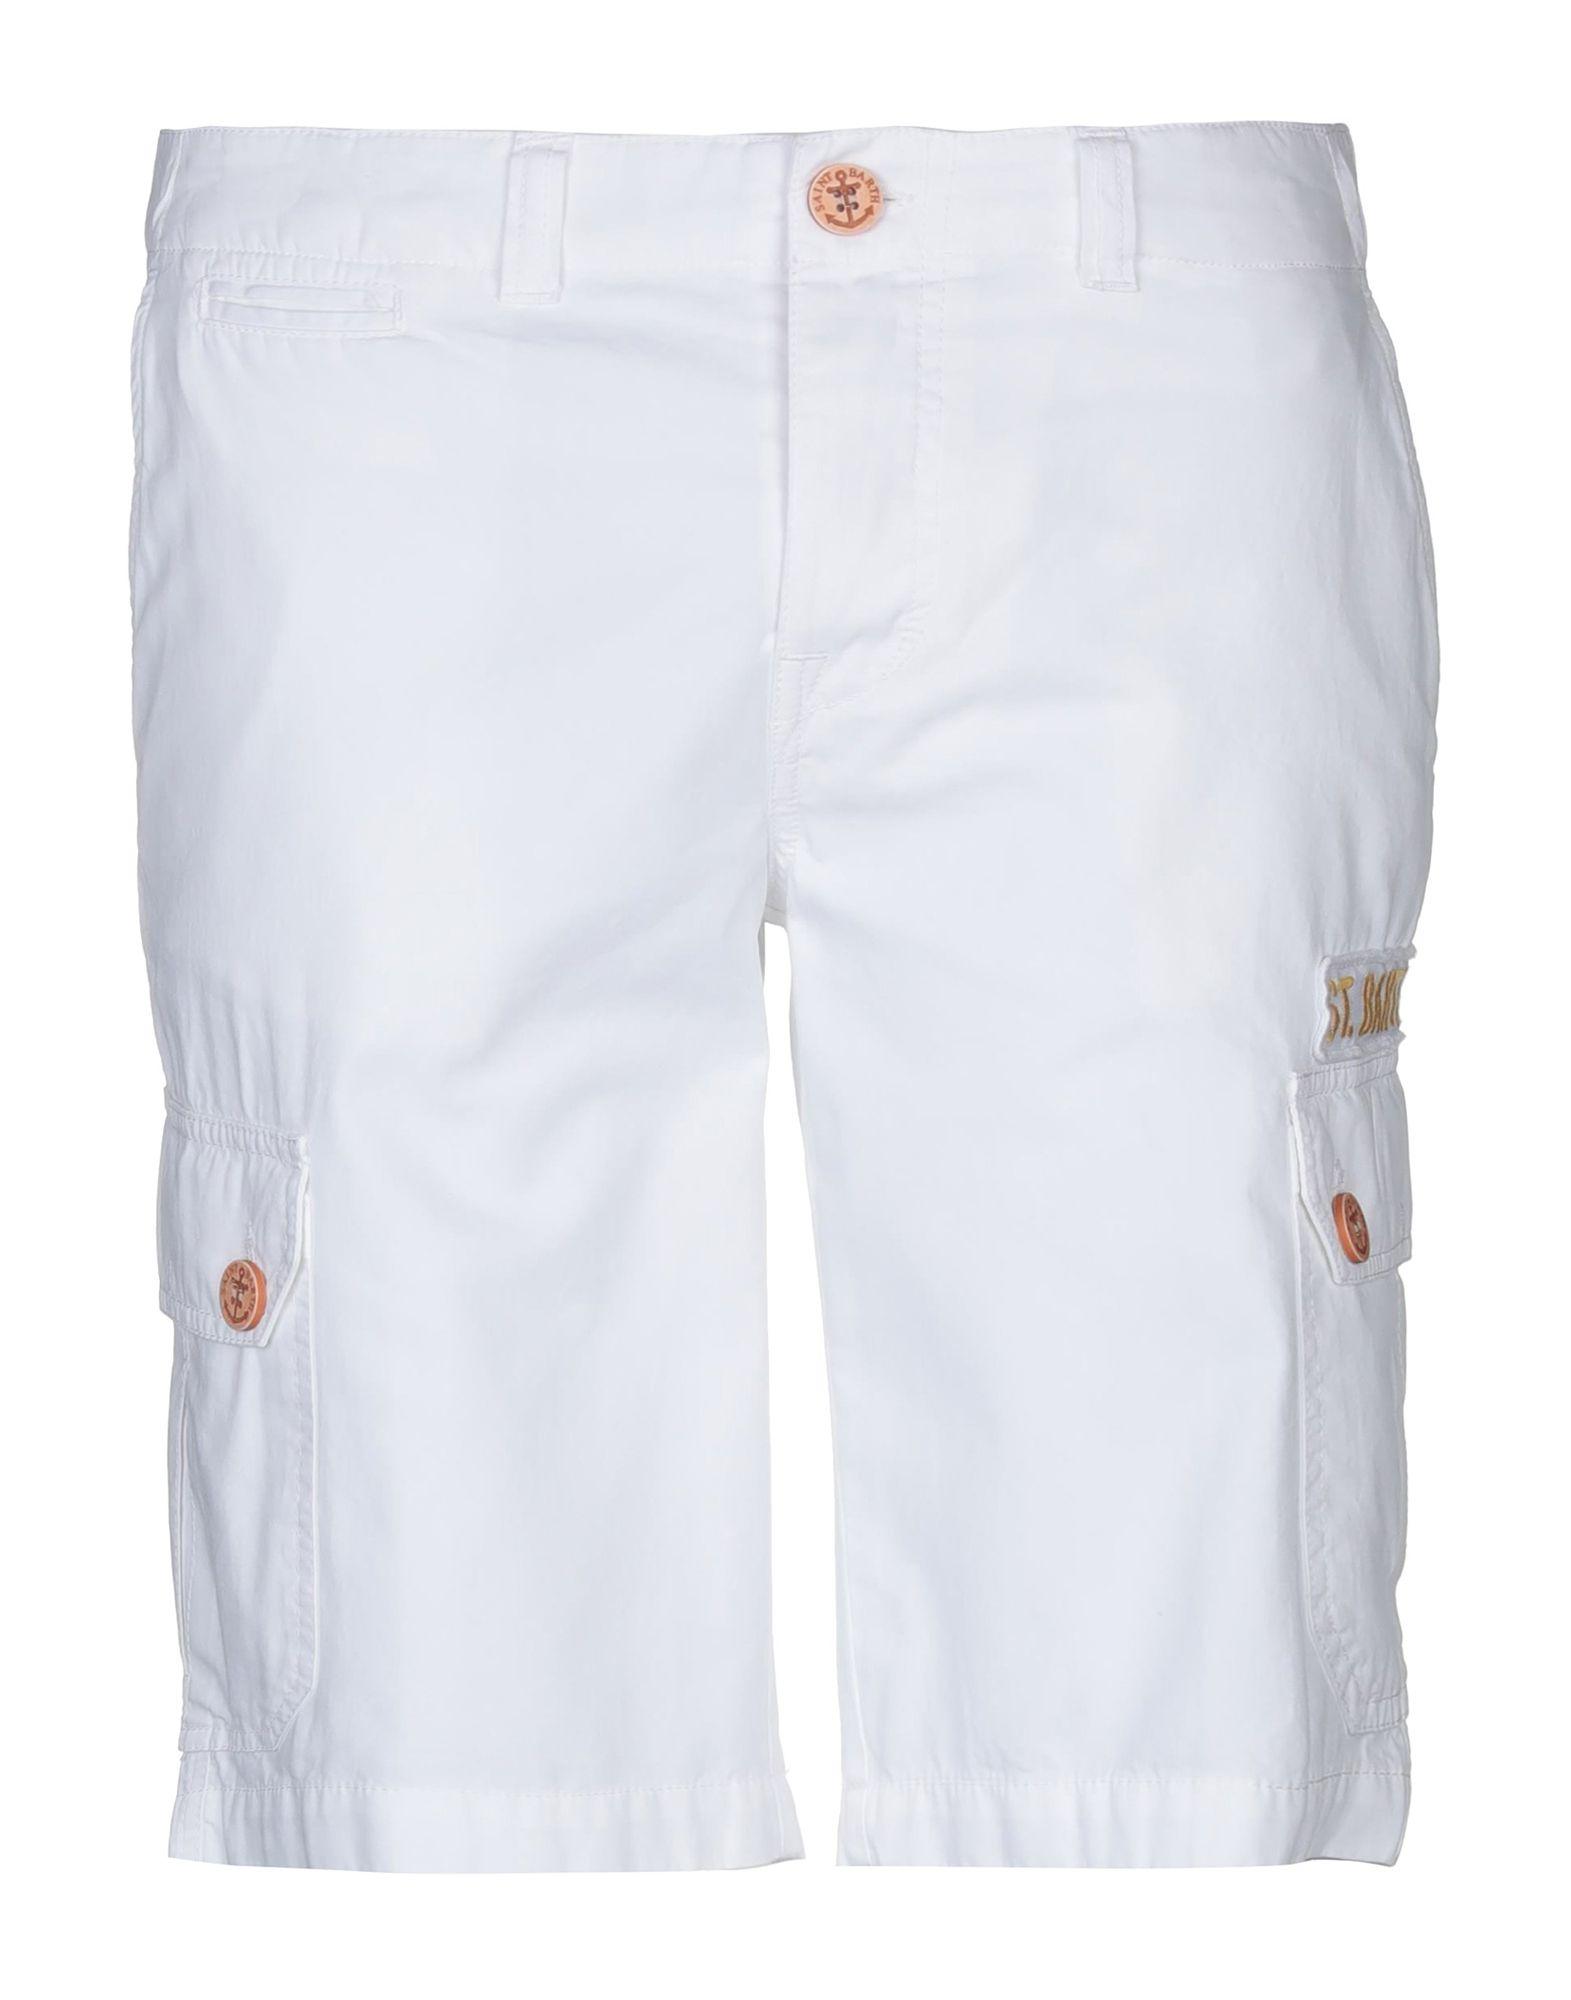 MC2 SAINT BARTH Bermudas. plain weave, logo, solid color, mid rise, button closing, multipockets, cargo. 100% Cotton